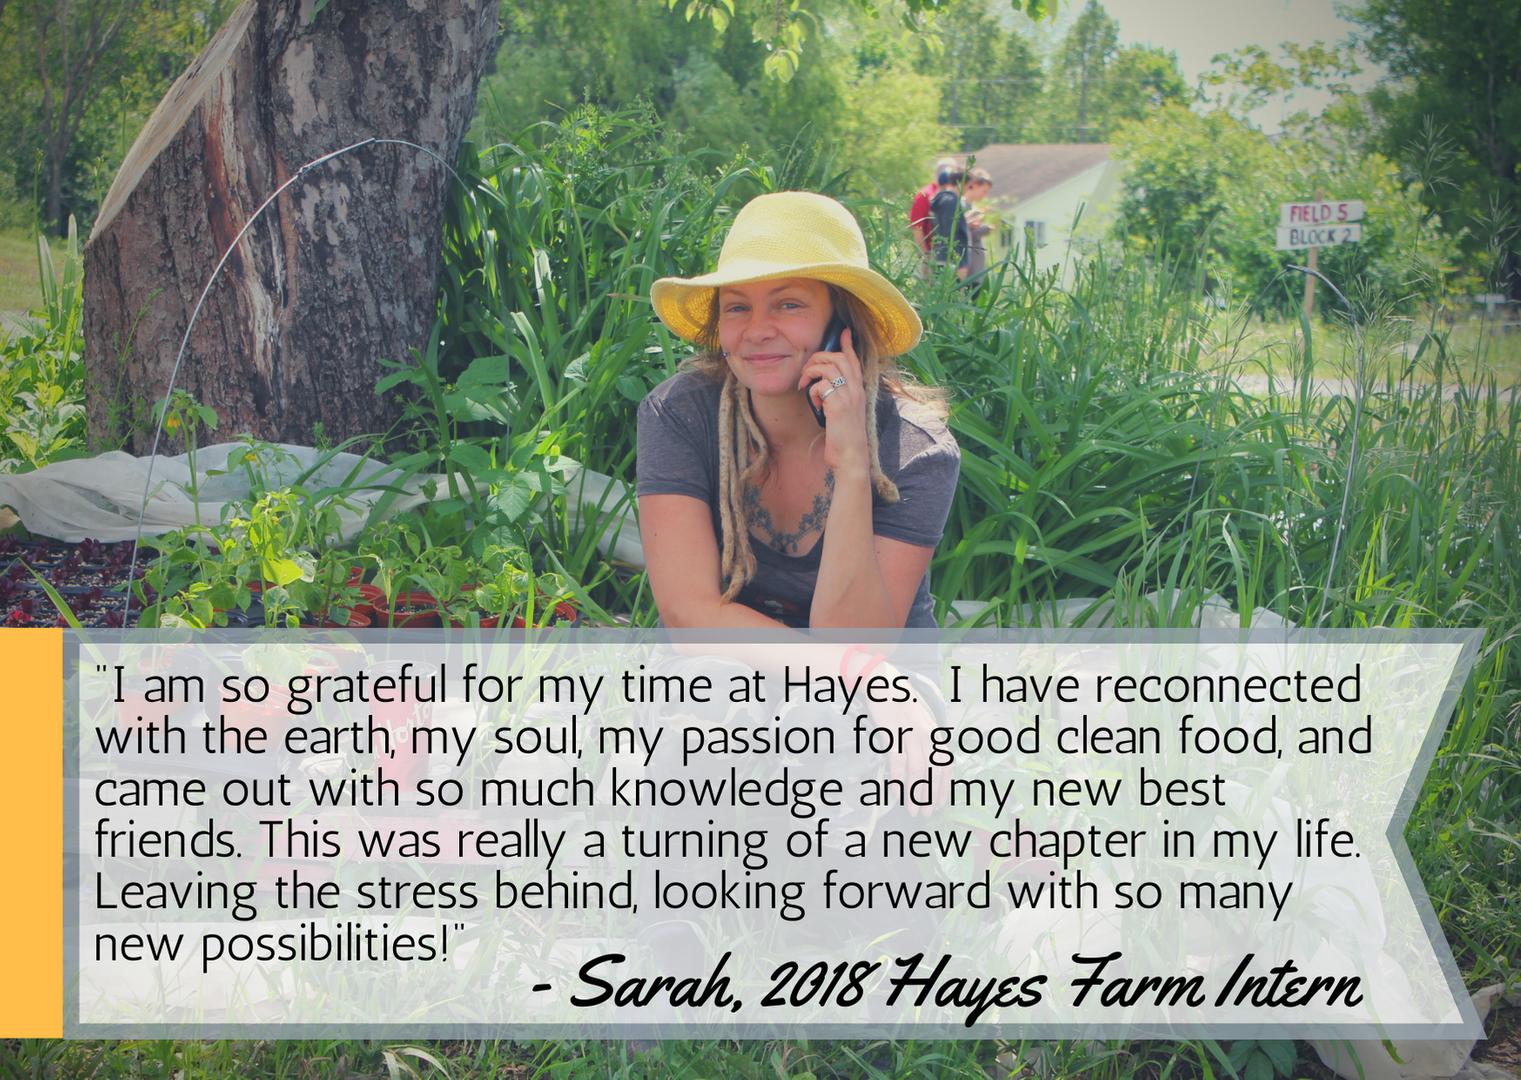 Sarah's testimonial